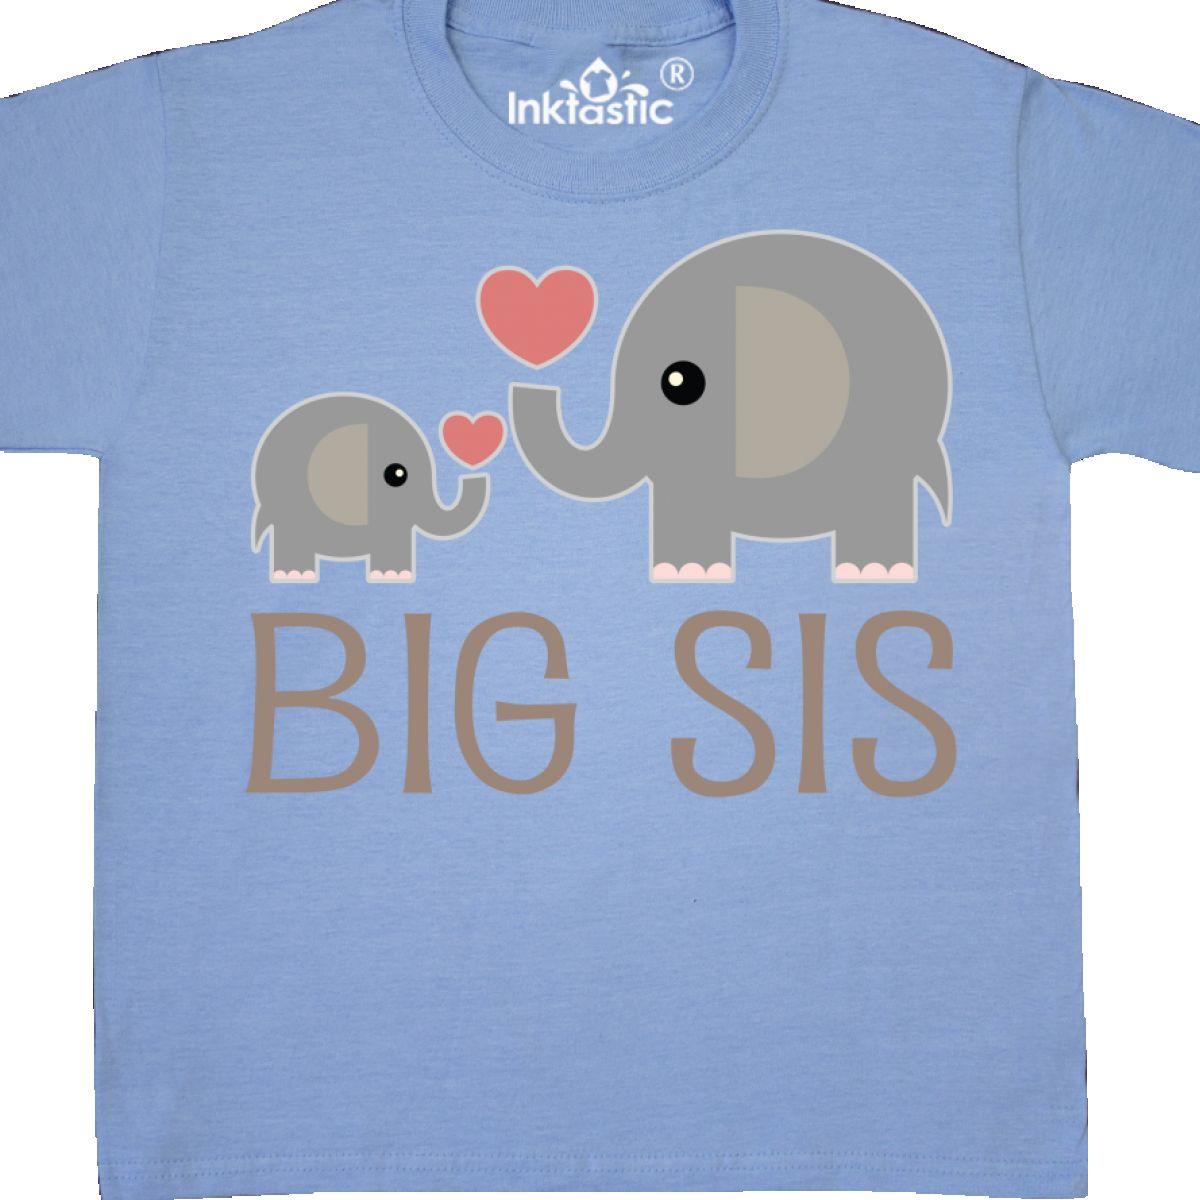 Inktastic Big Sis Elephant Youth T-Shirt Kids Sister Siblings Cute Girls Childs